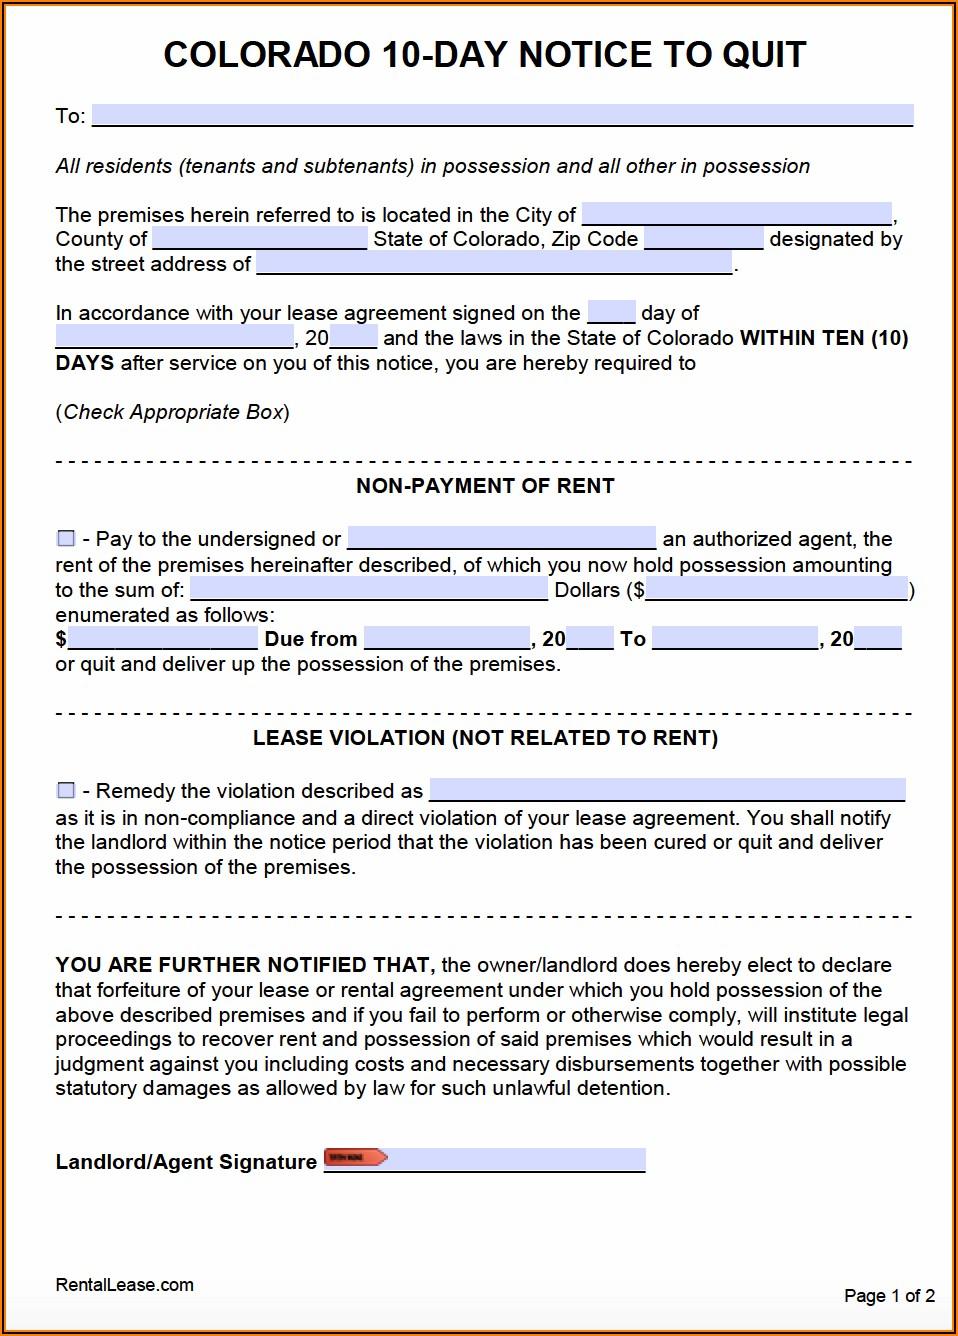 Colorado 10 Day Notice To Quit Form